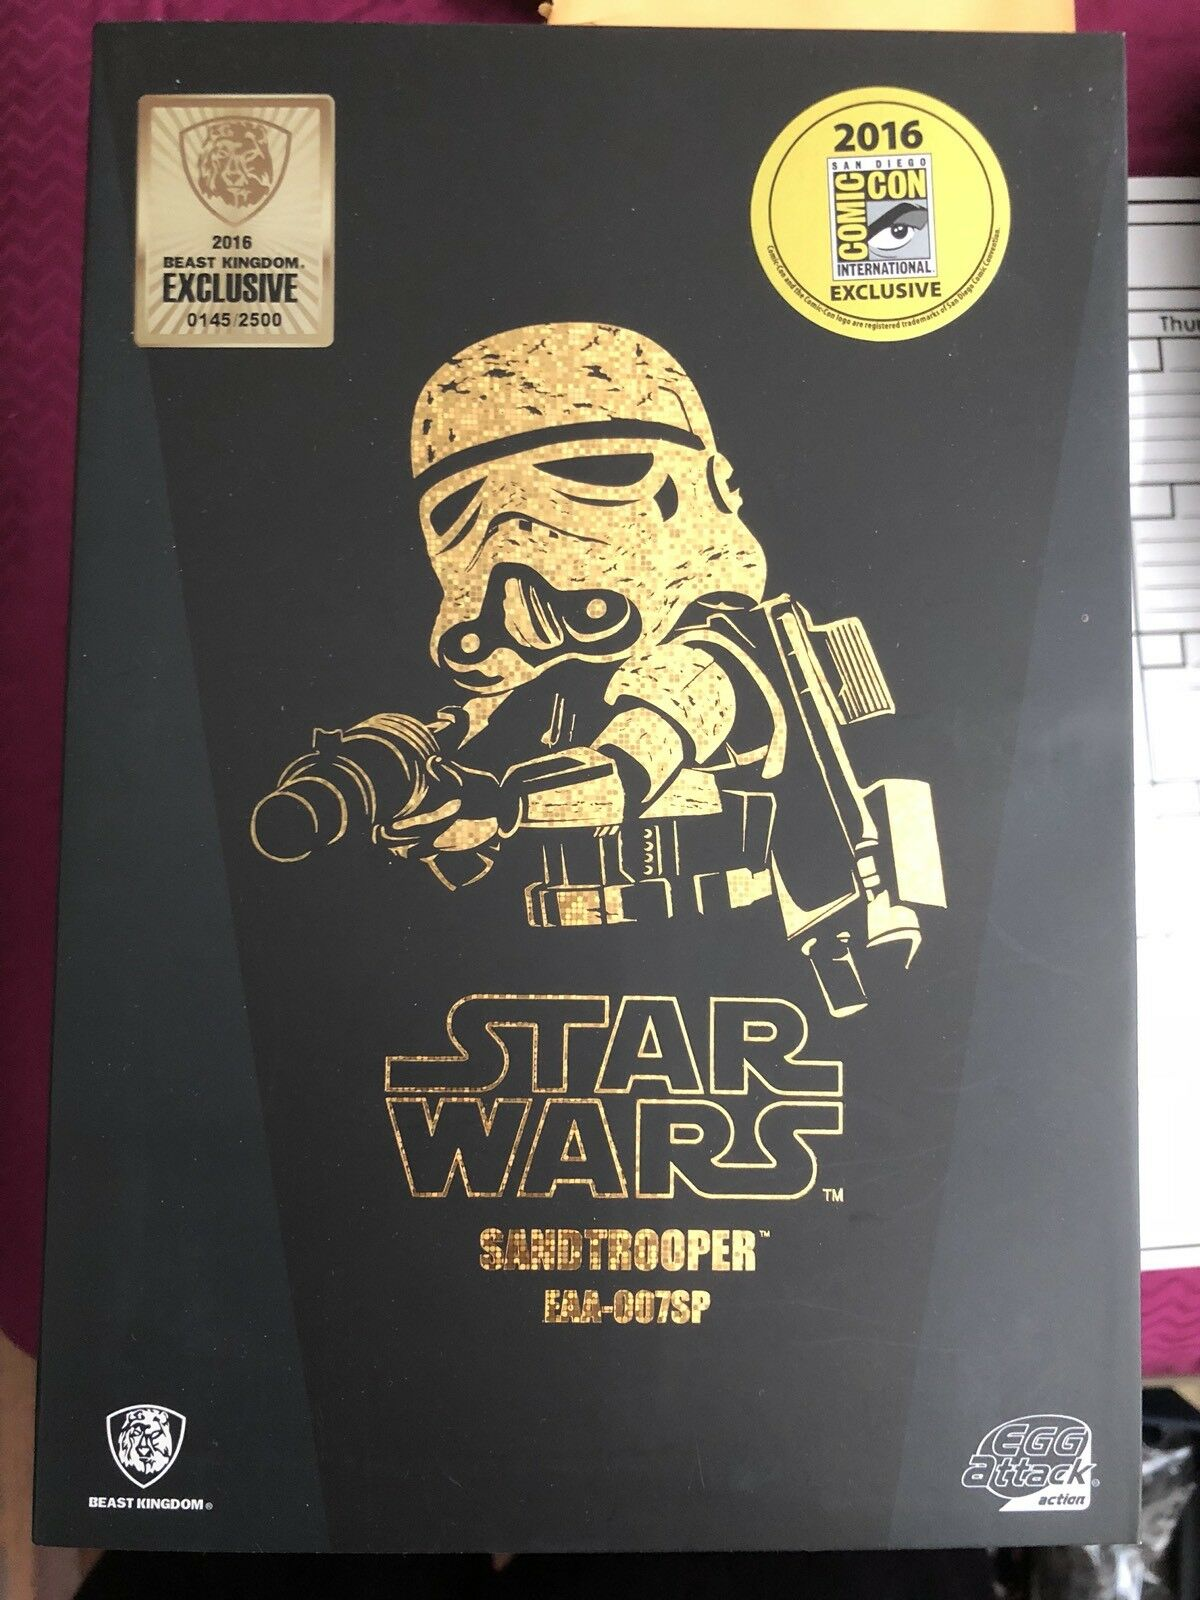 San Diego comic-con 2018 Bestia Reino Sandtrooper Oro Figura De Star Wars Exclusivo de ataque